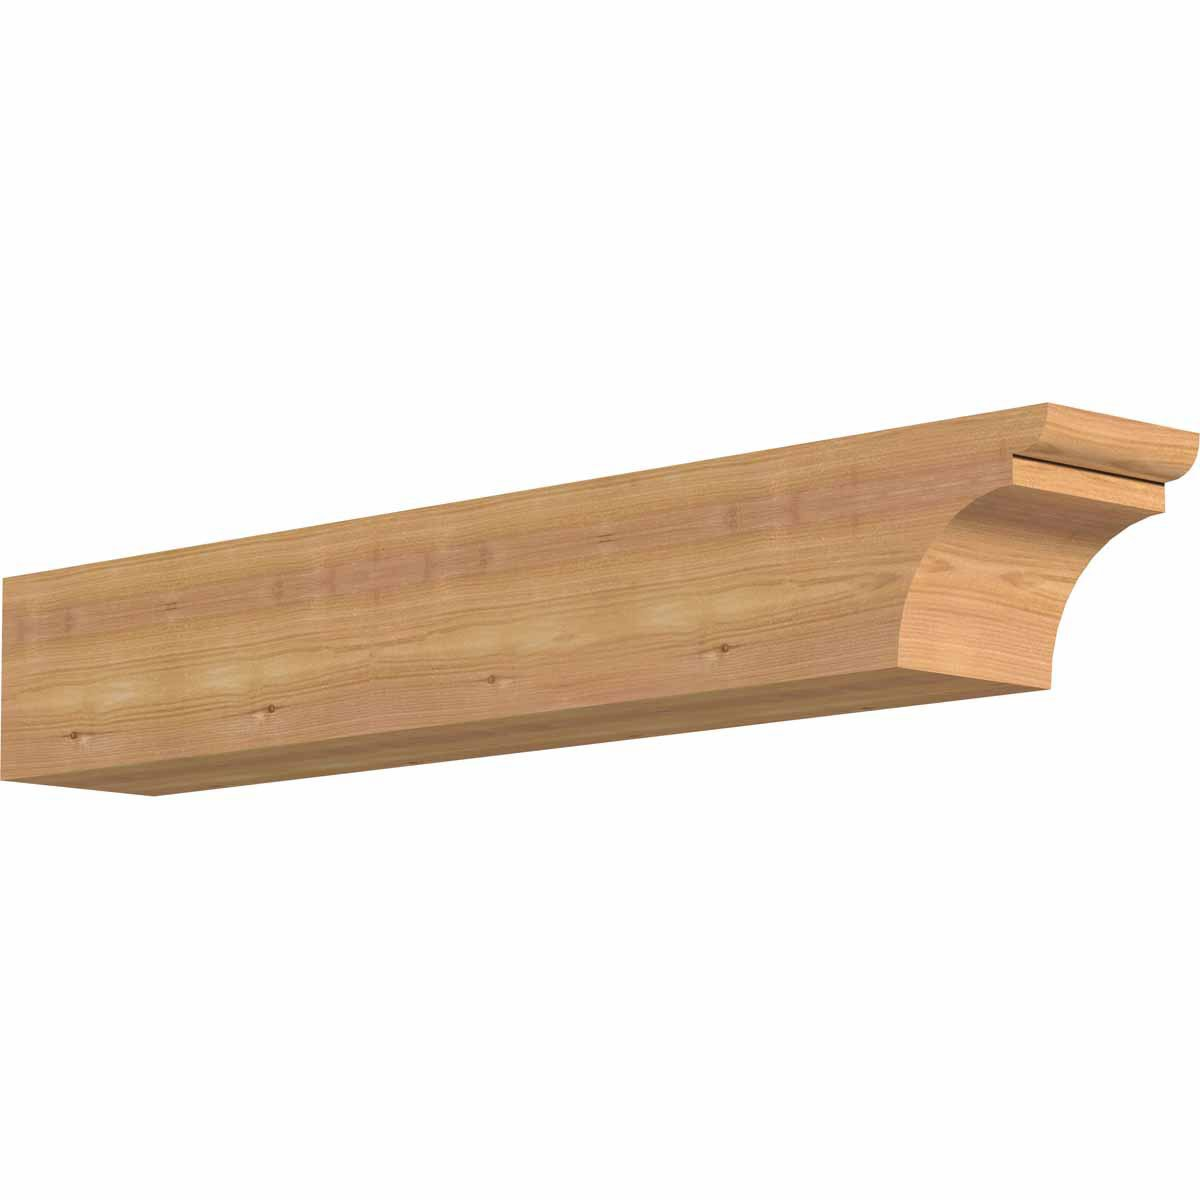 Ekena Millwork RFT06X06X36YOR00SWR Yorktown Smooth Rafter Tail, 5 1/2'' Width by 6'' Height by 36'' Length, Western Red Cedar by Ekena Millwork